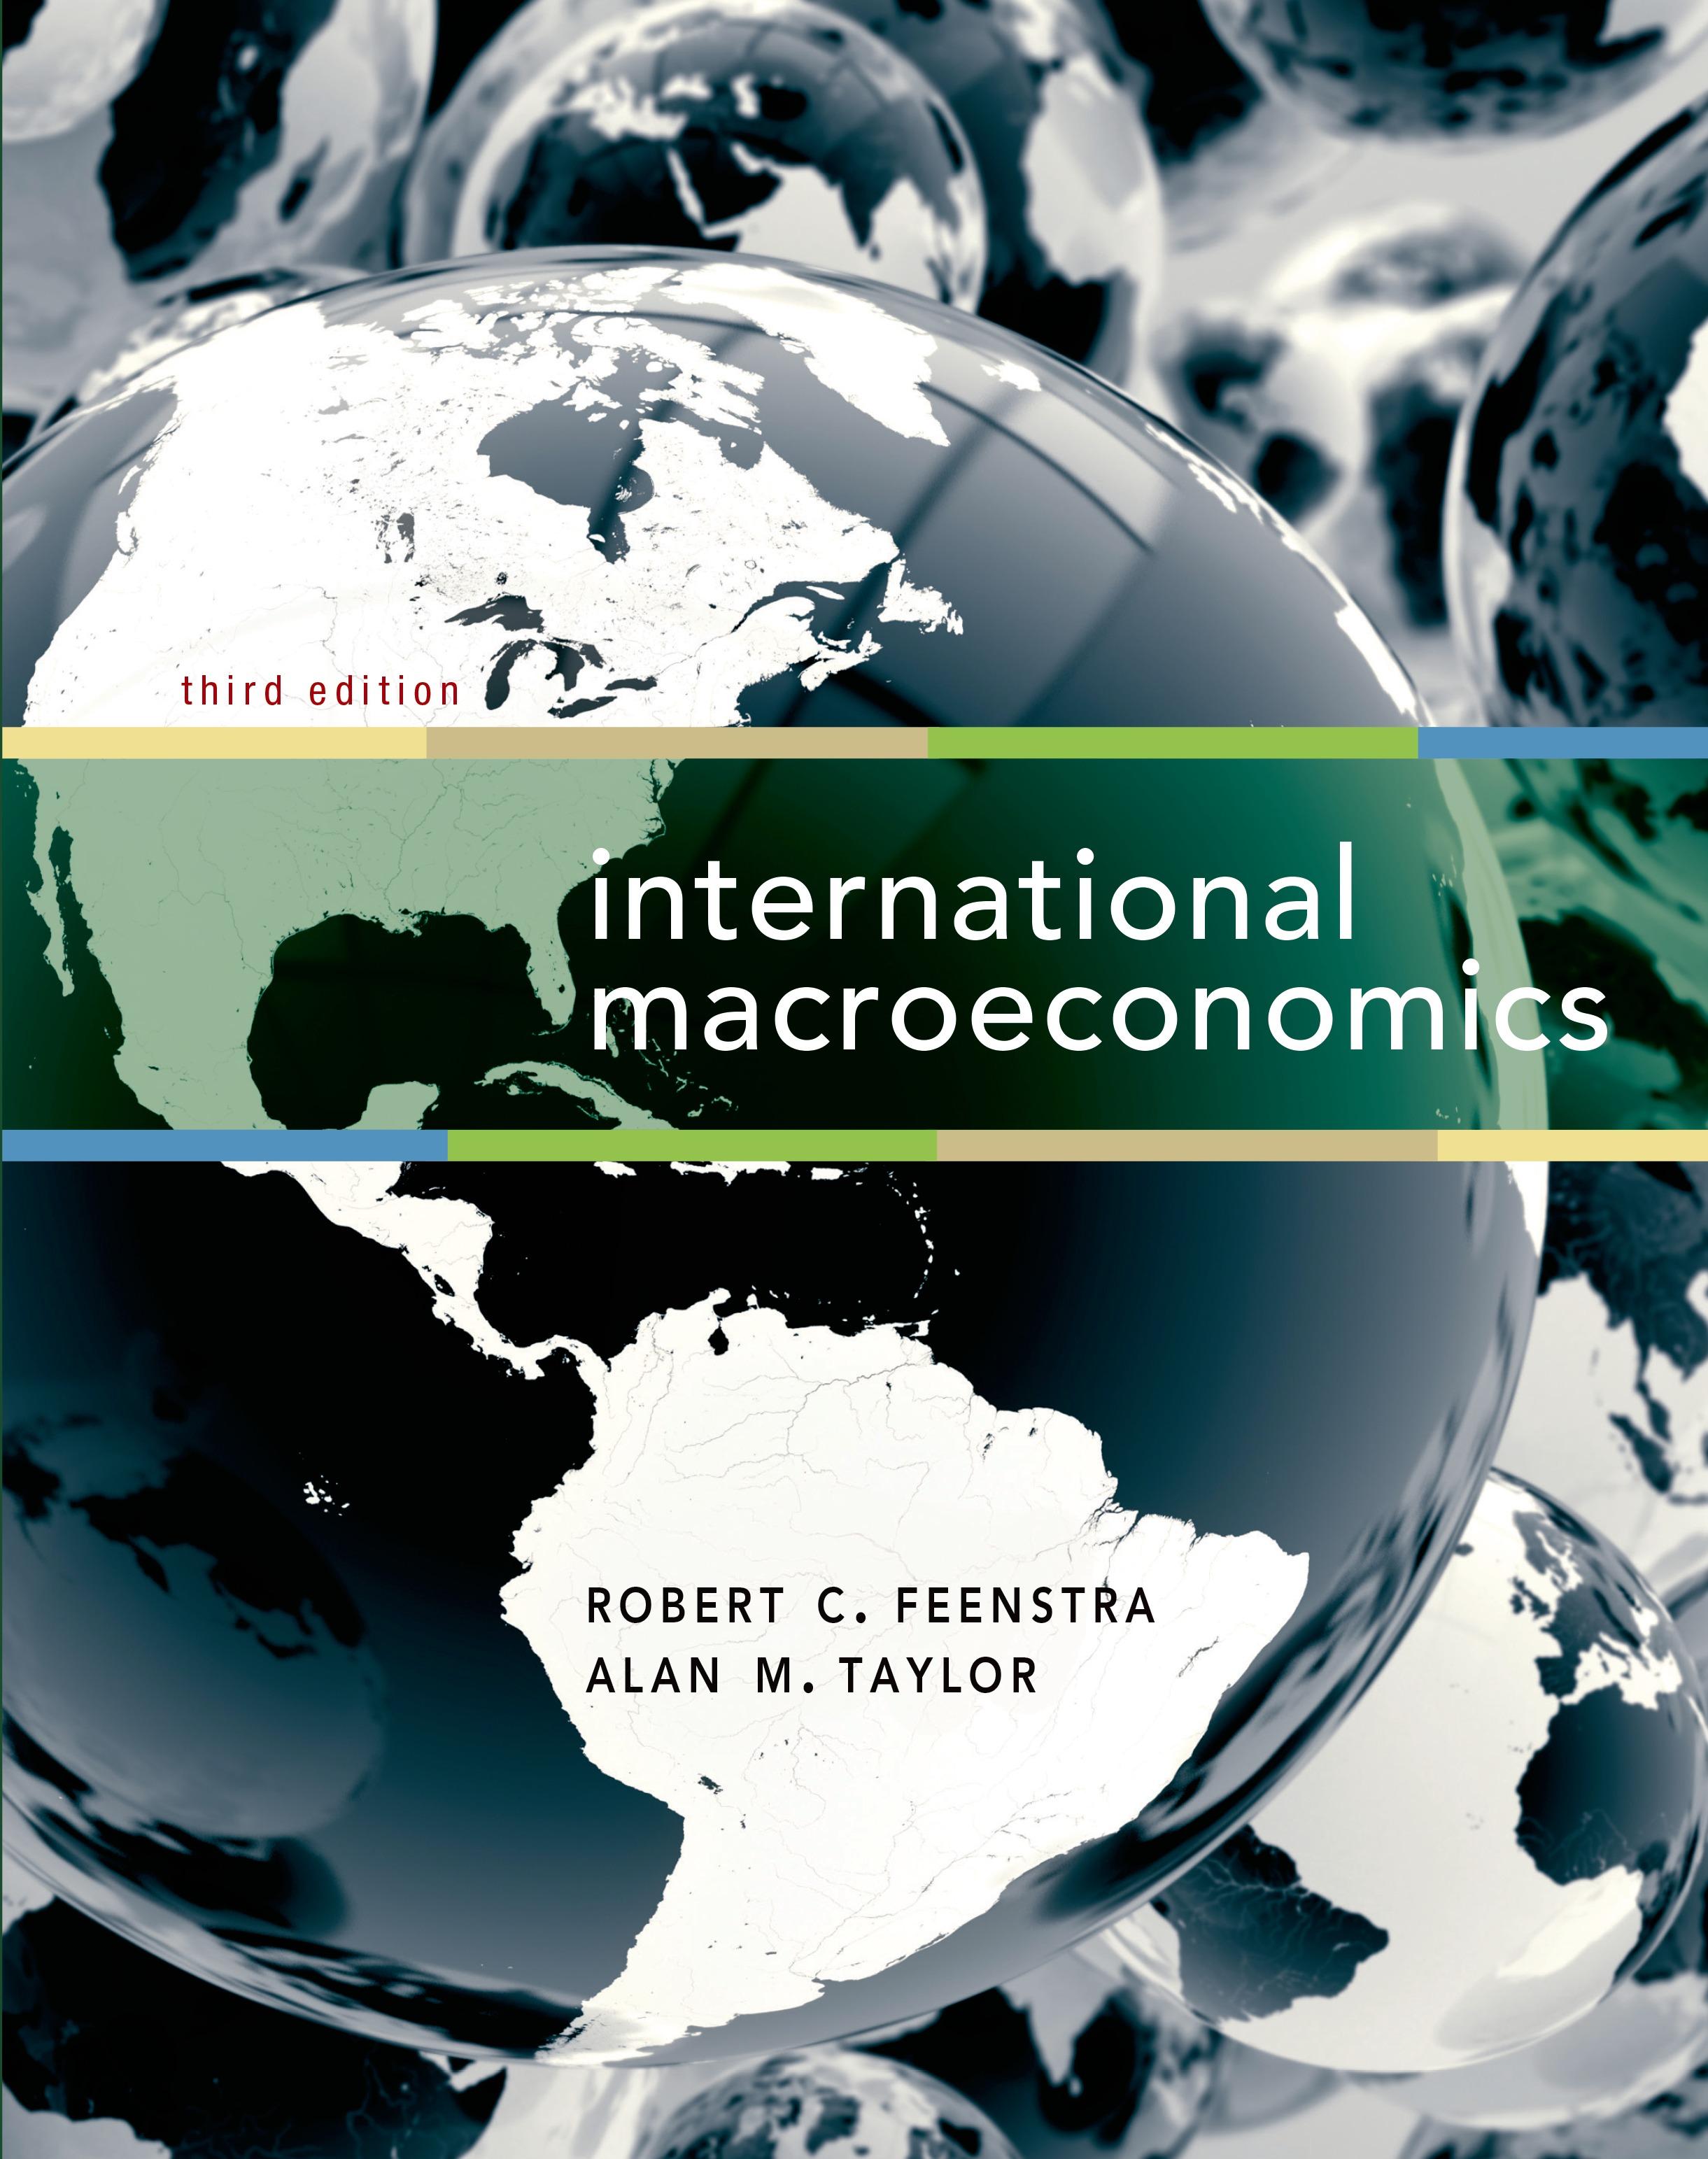 Download Image International Macroeconomics